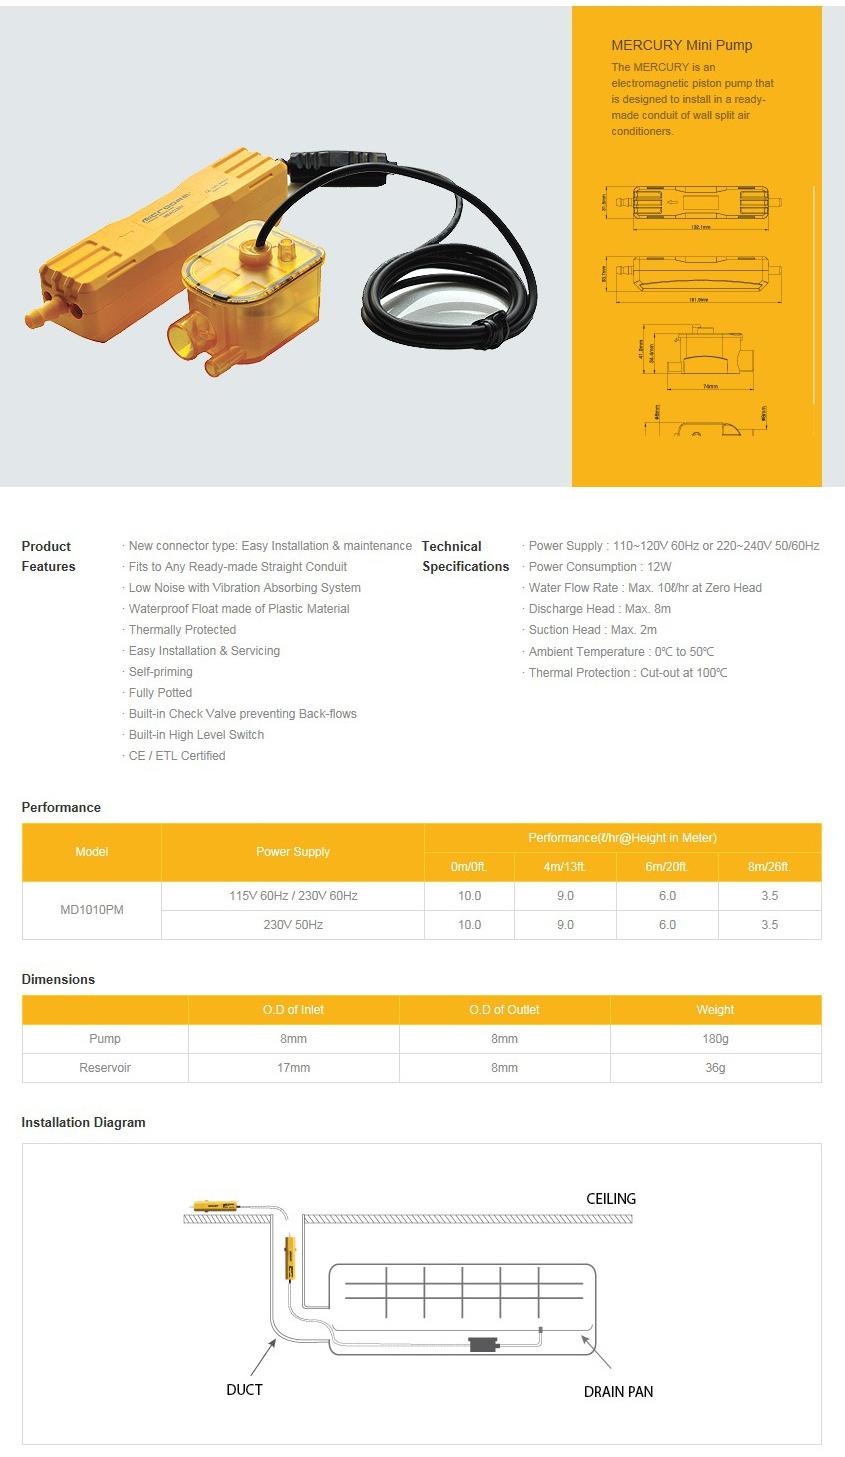 SUNGSHIN HASCO - MERCURY Mini Pump - MD1010PM - Condensate